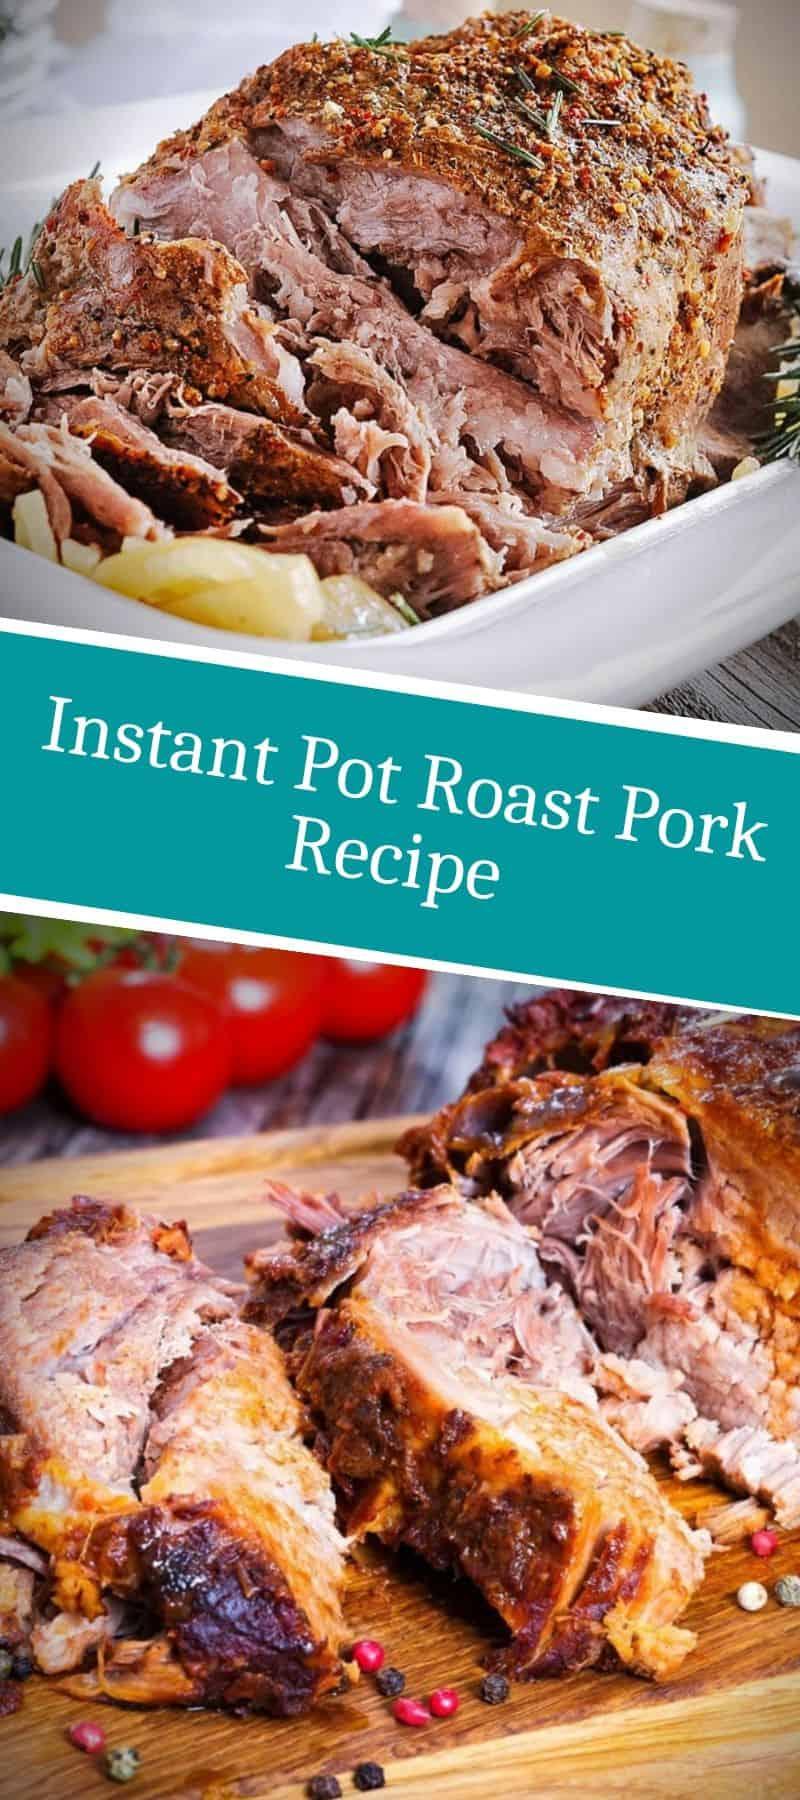 Instant Pot Roast Pork Recipe 3